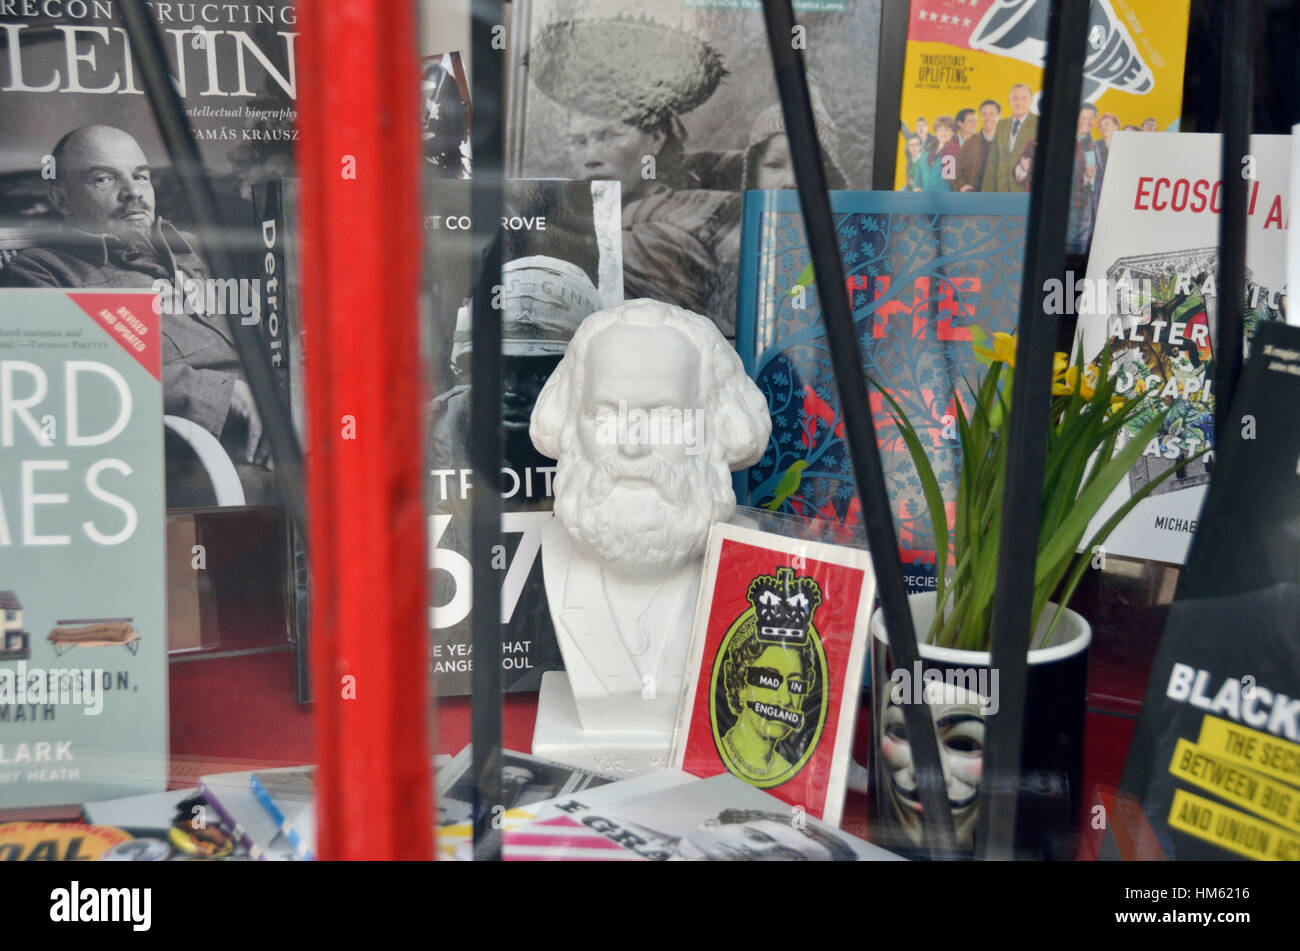 Statue of Karl Mark in a socialist bookshop window - Stock Image